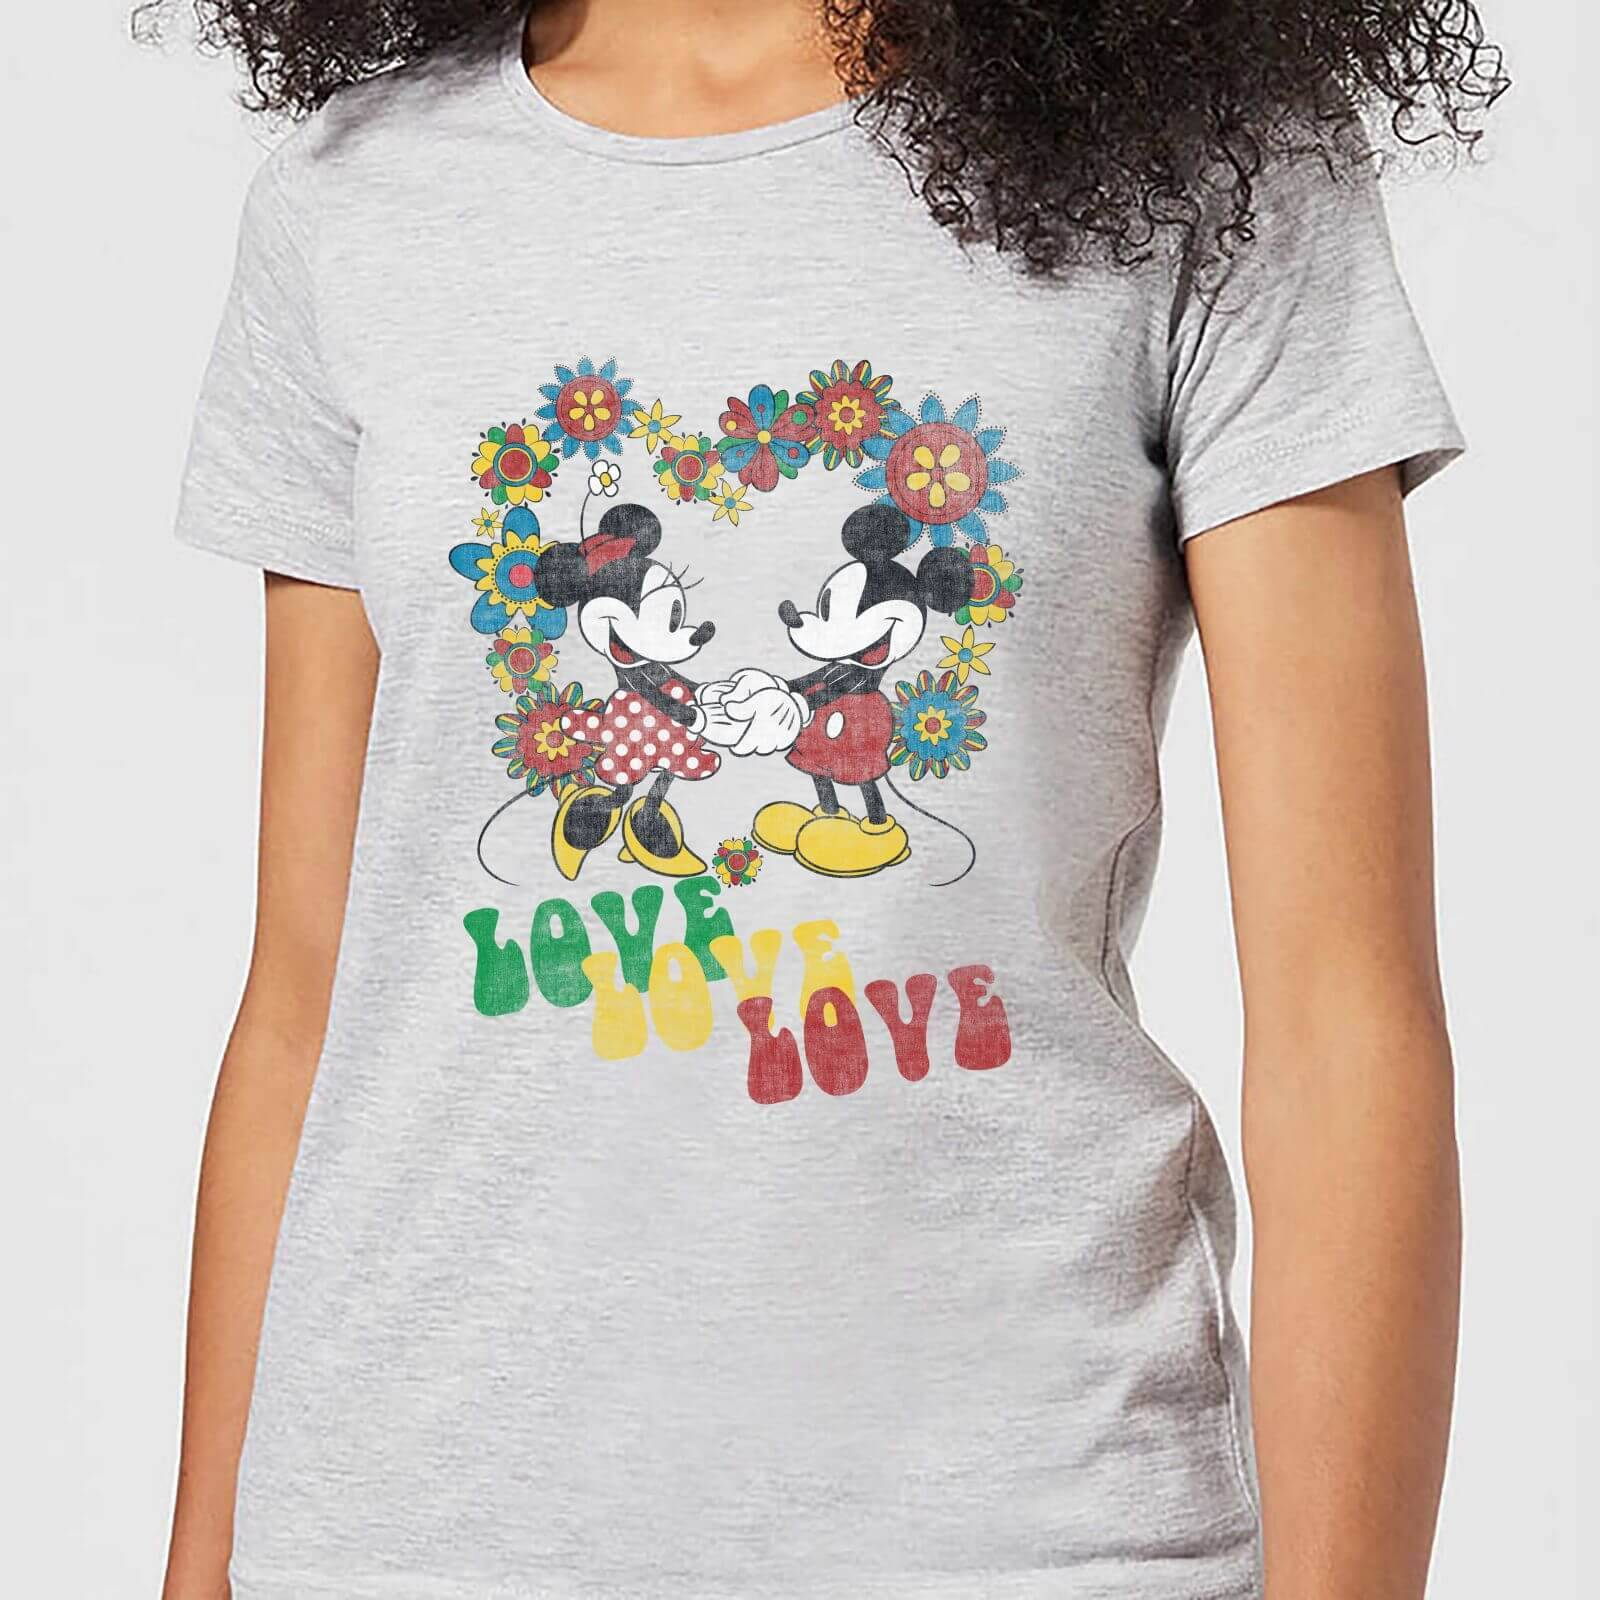 Disney Mickey Mouse Hippie Love Women's T-Shirt - Grey - 5XL - Grey